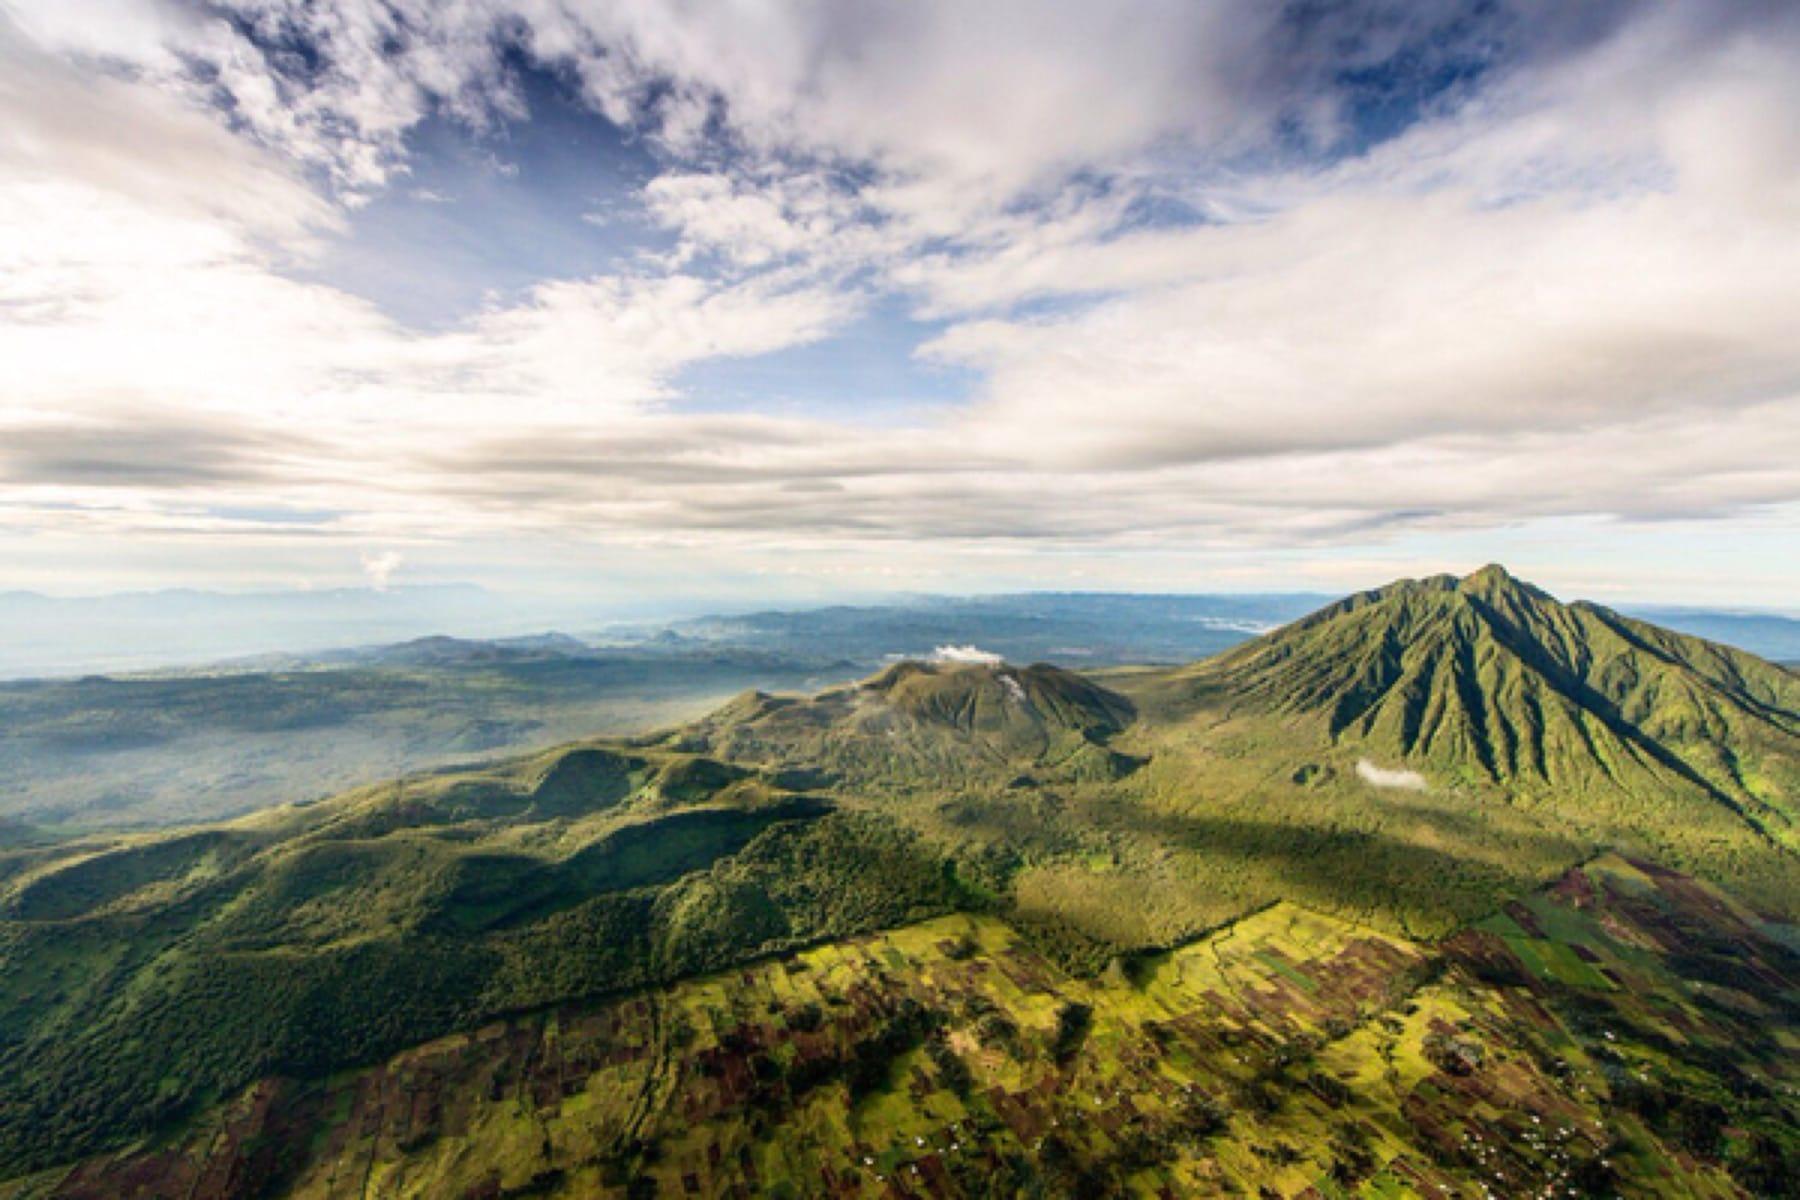 virunga mountain range